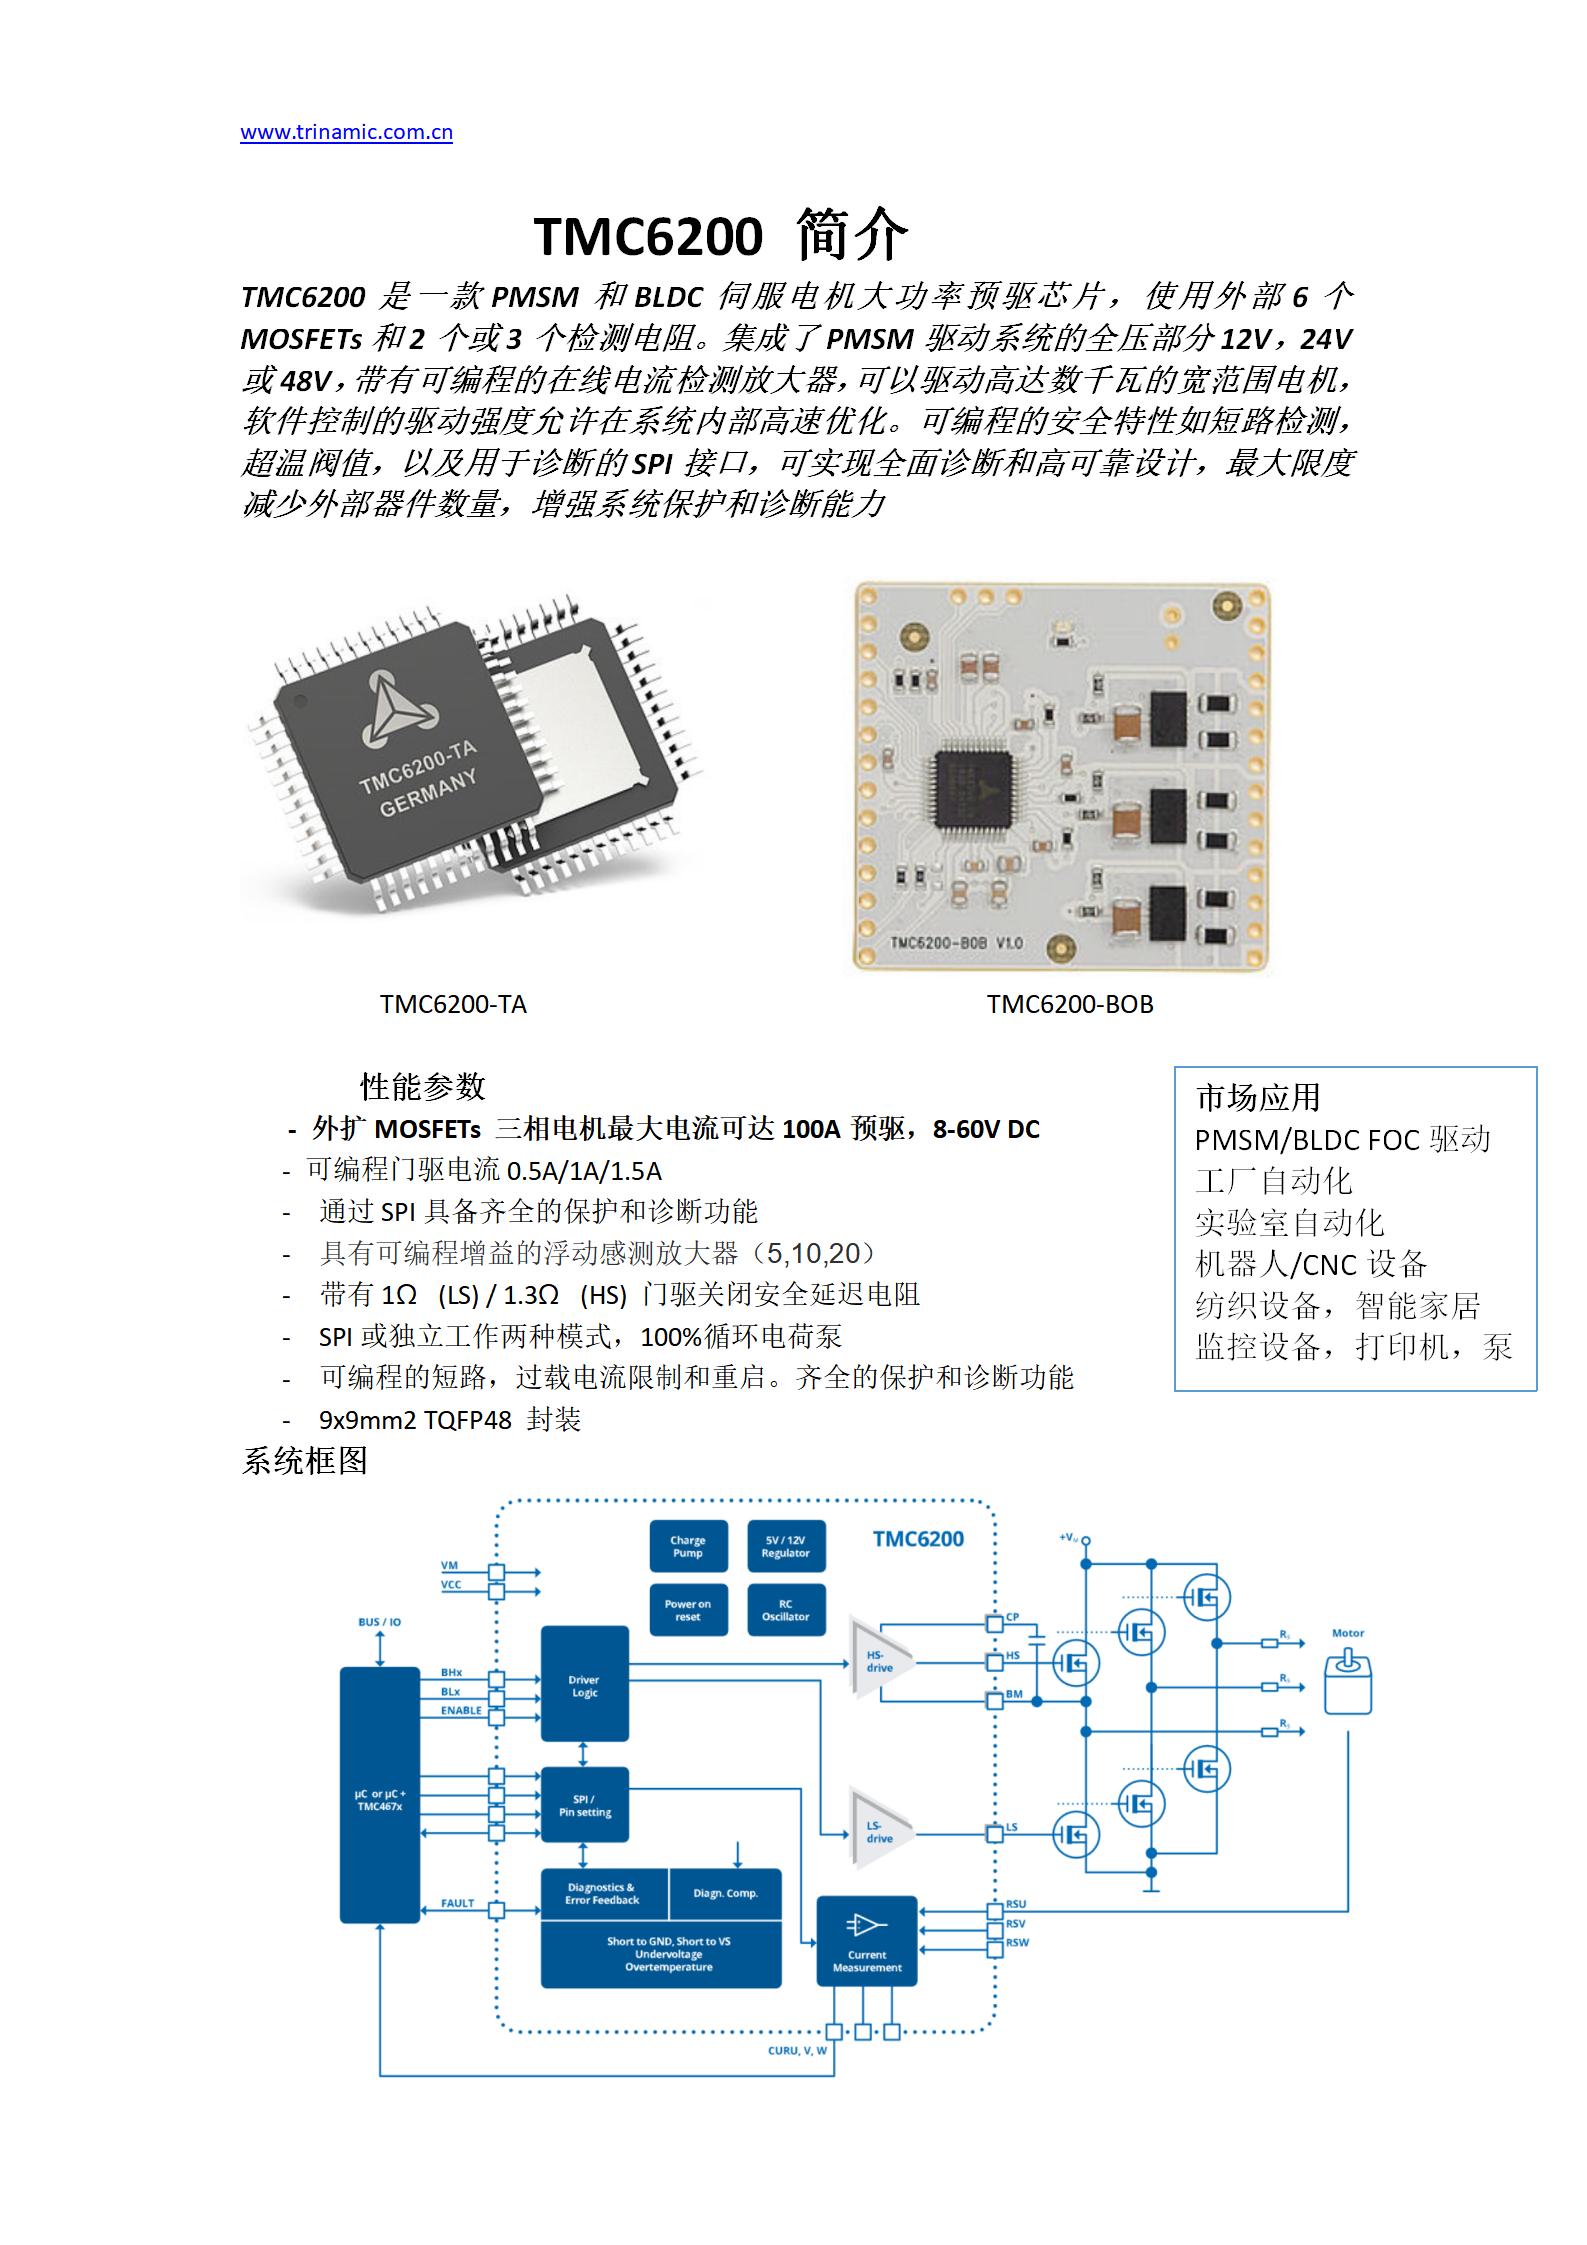 TRINAMIC推出PMSM BLDC三相智能预驱芯片TMC6200